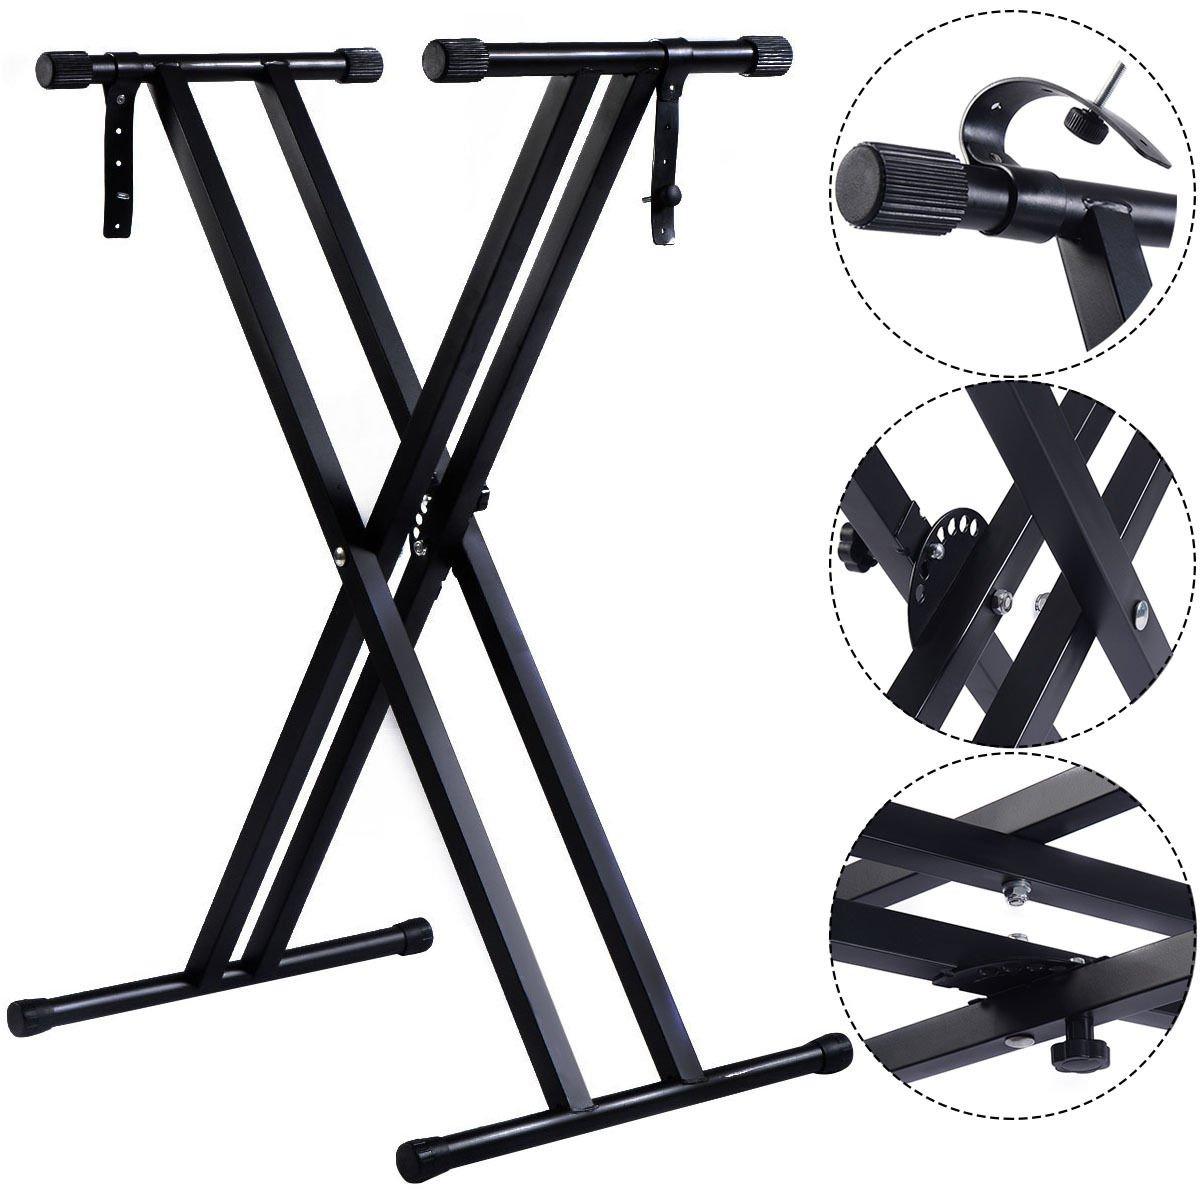 Costzon New Adjustable Metal Music Keyboard Electronic Piano Dual Tube X Stand Standard Rack